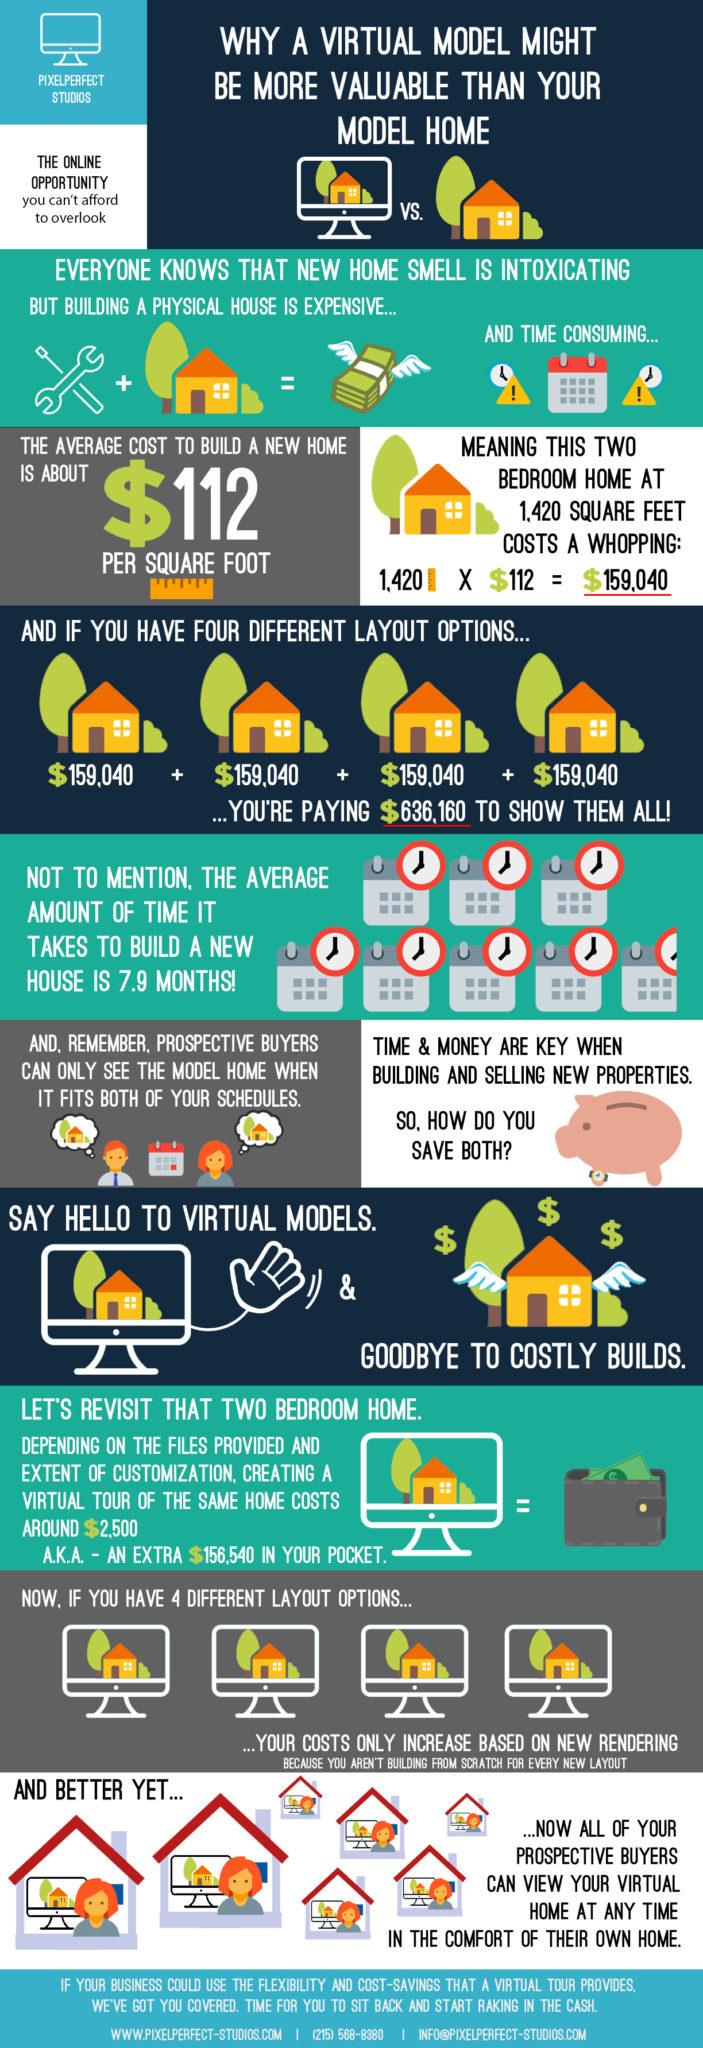 Virtual tour of model homes